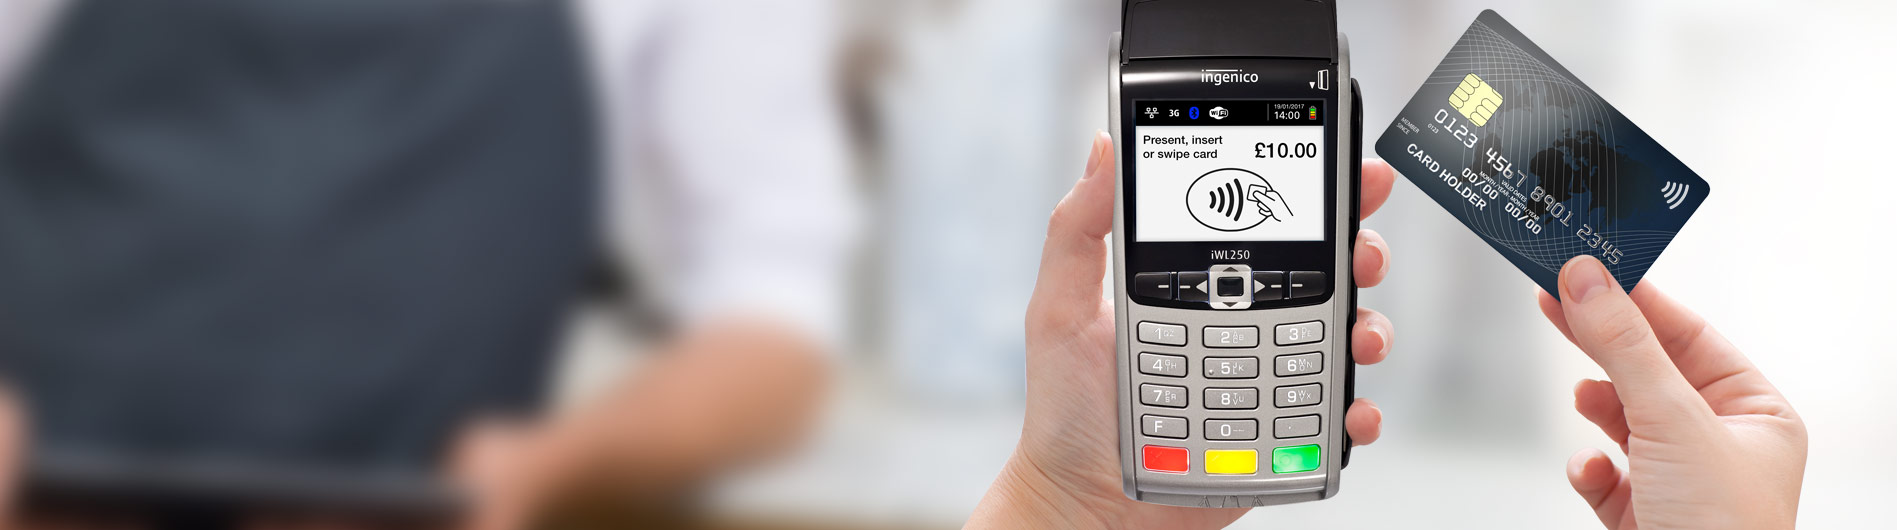 Uk Cardline – Card Payment Services UK